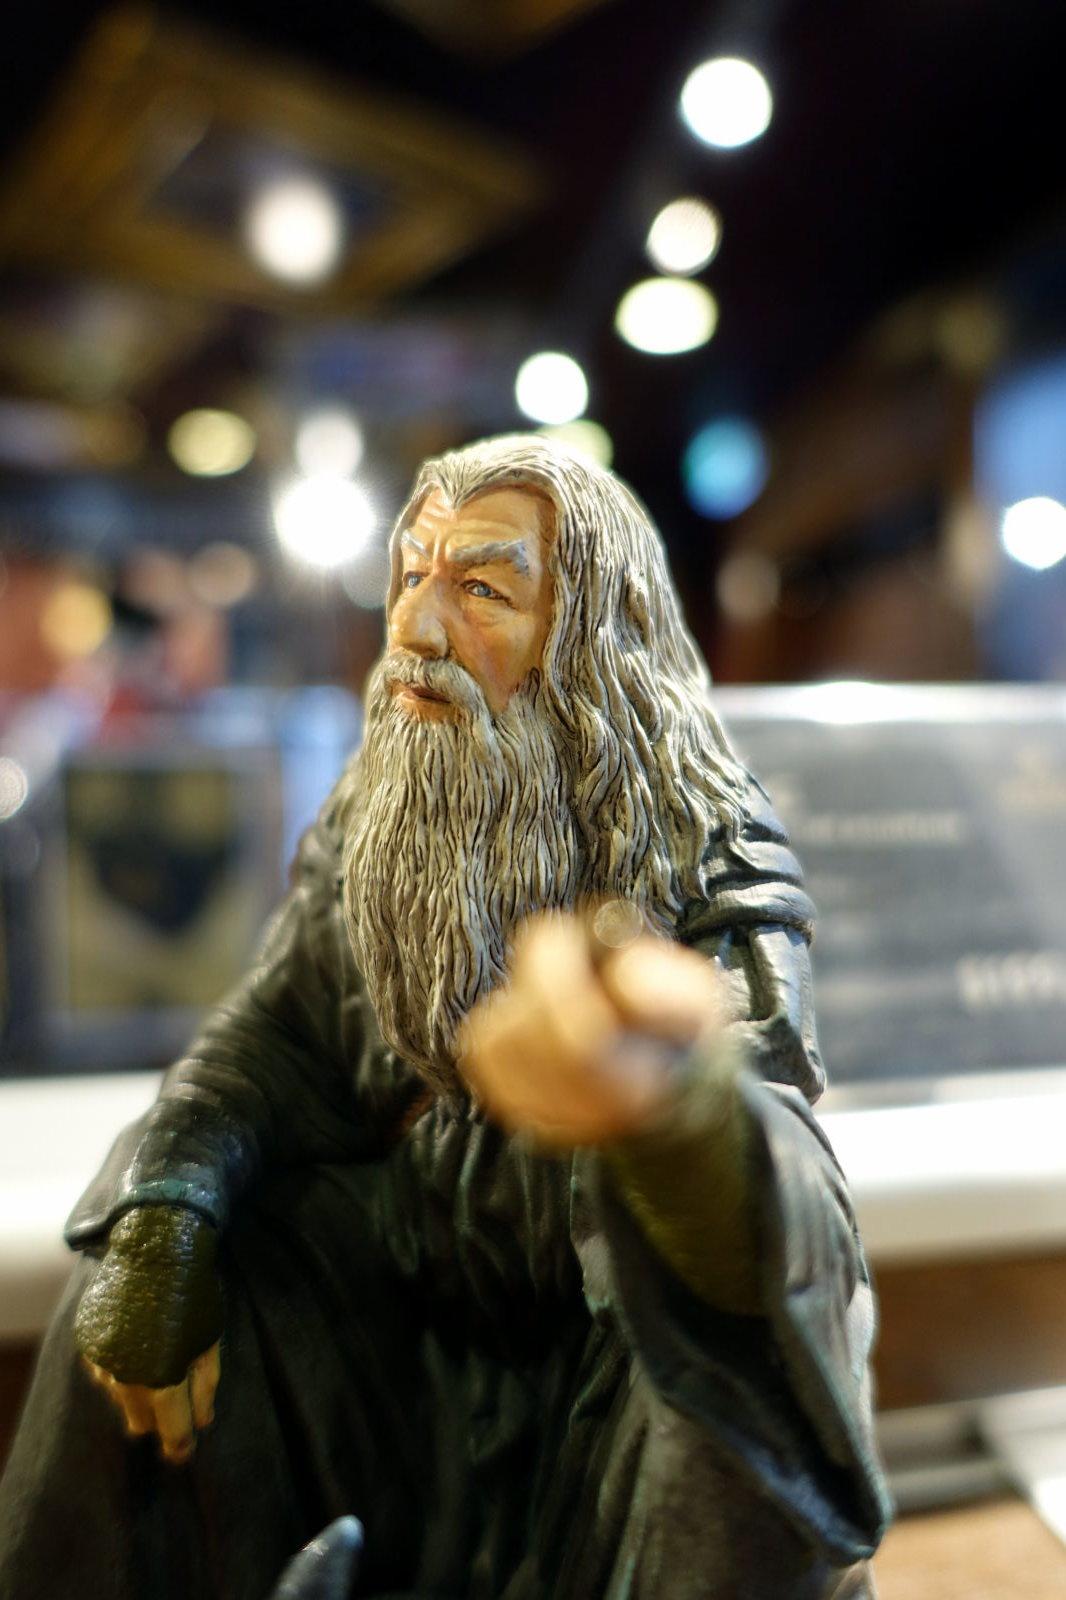 Clos-up on Gandalf figure.